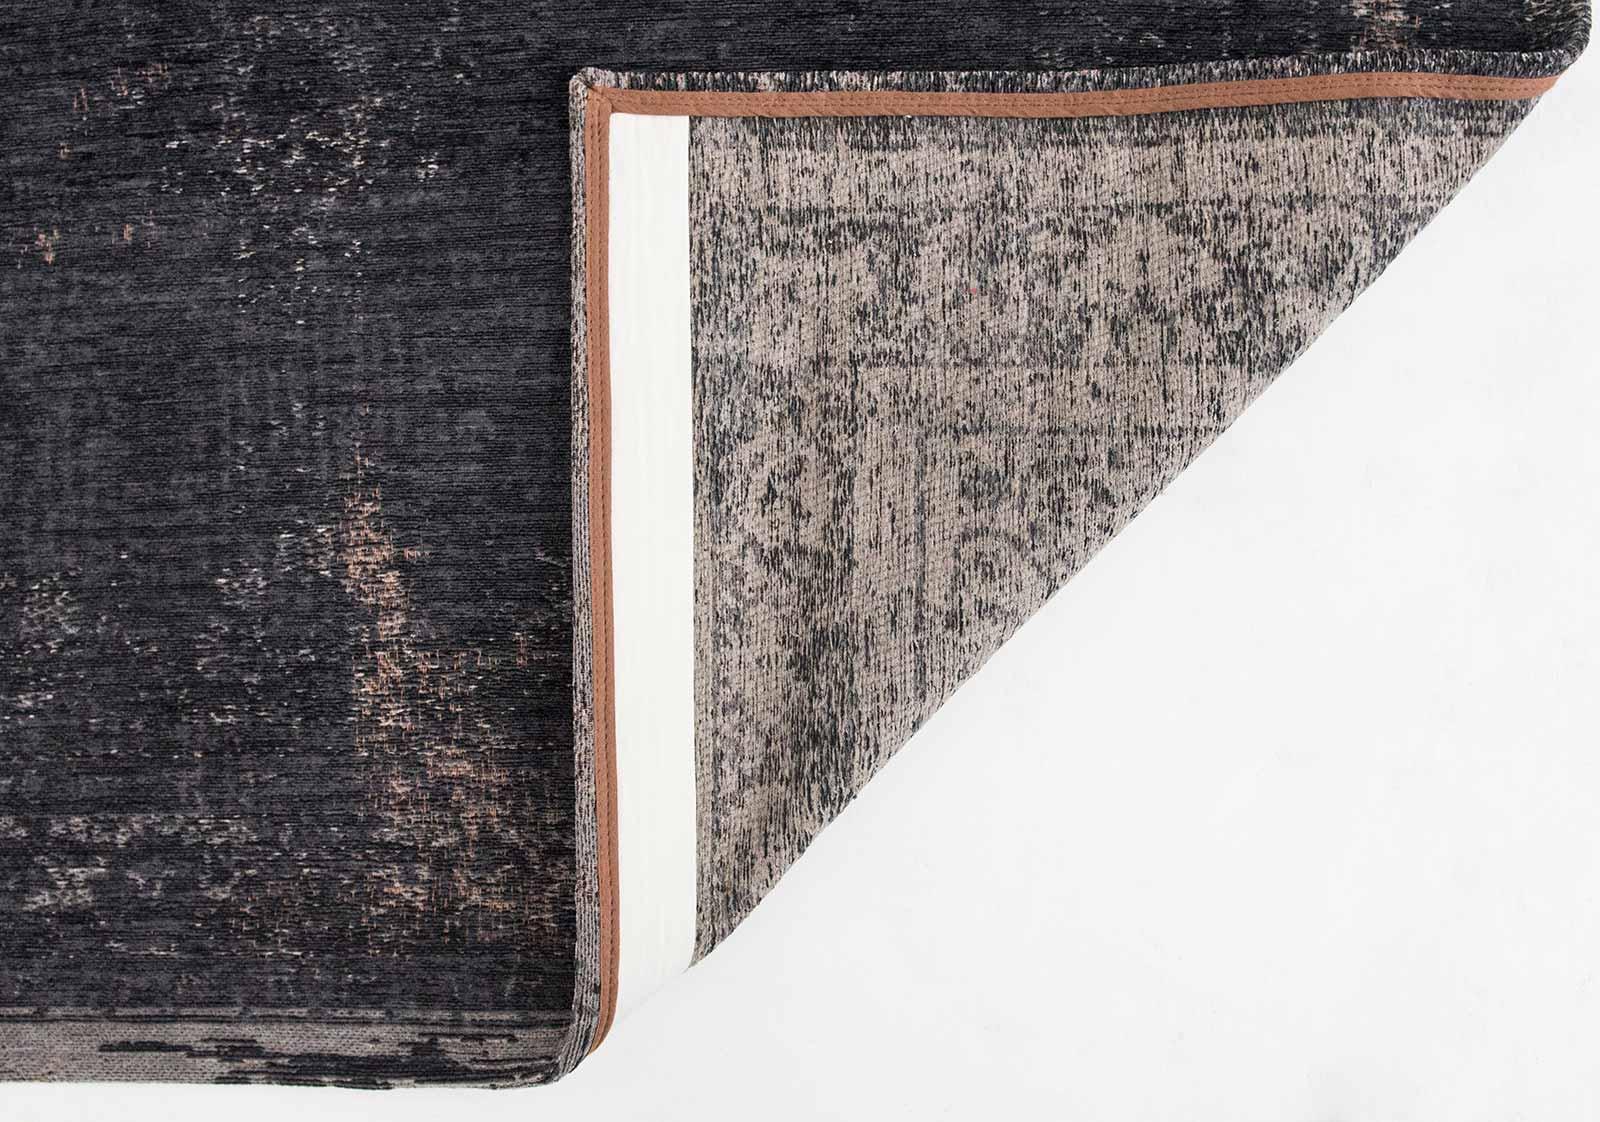 teppich Louis De Poortere LX 8263 Fading World Medaillon Mineral Black back